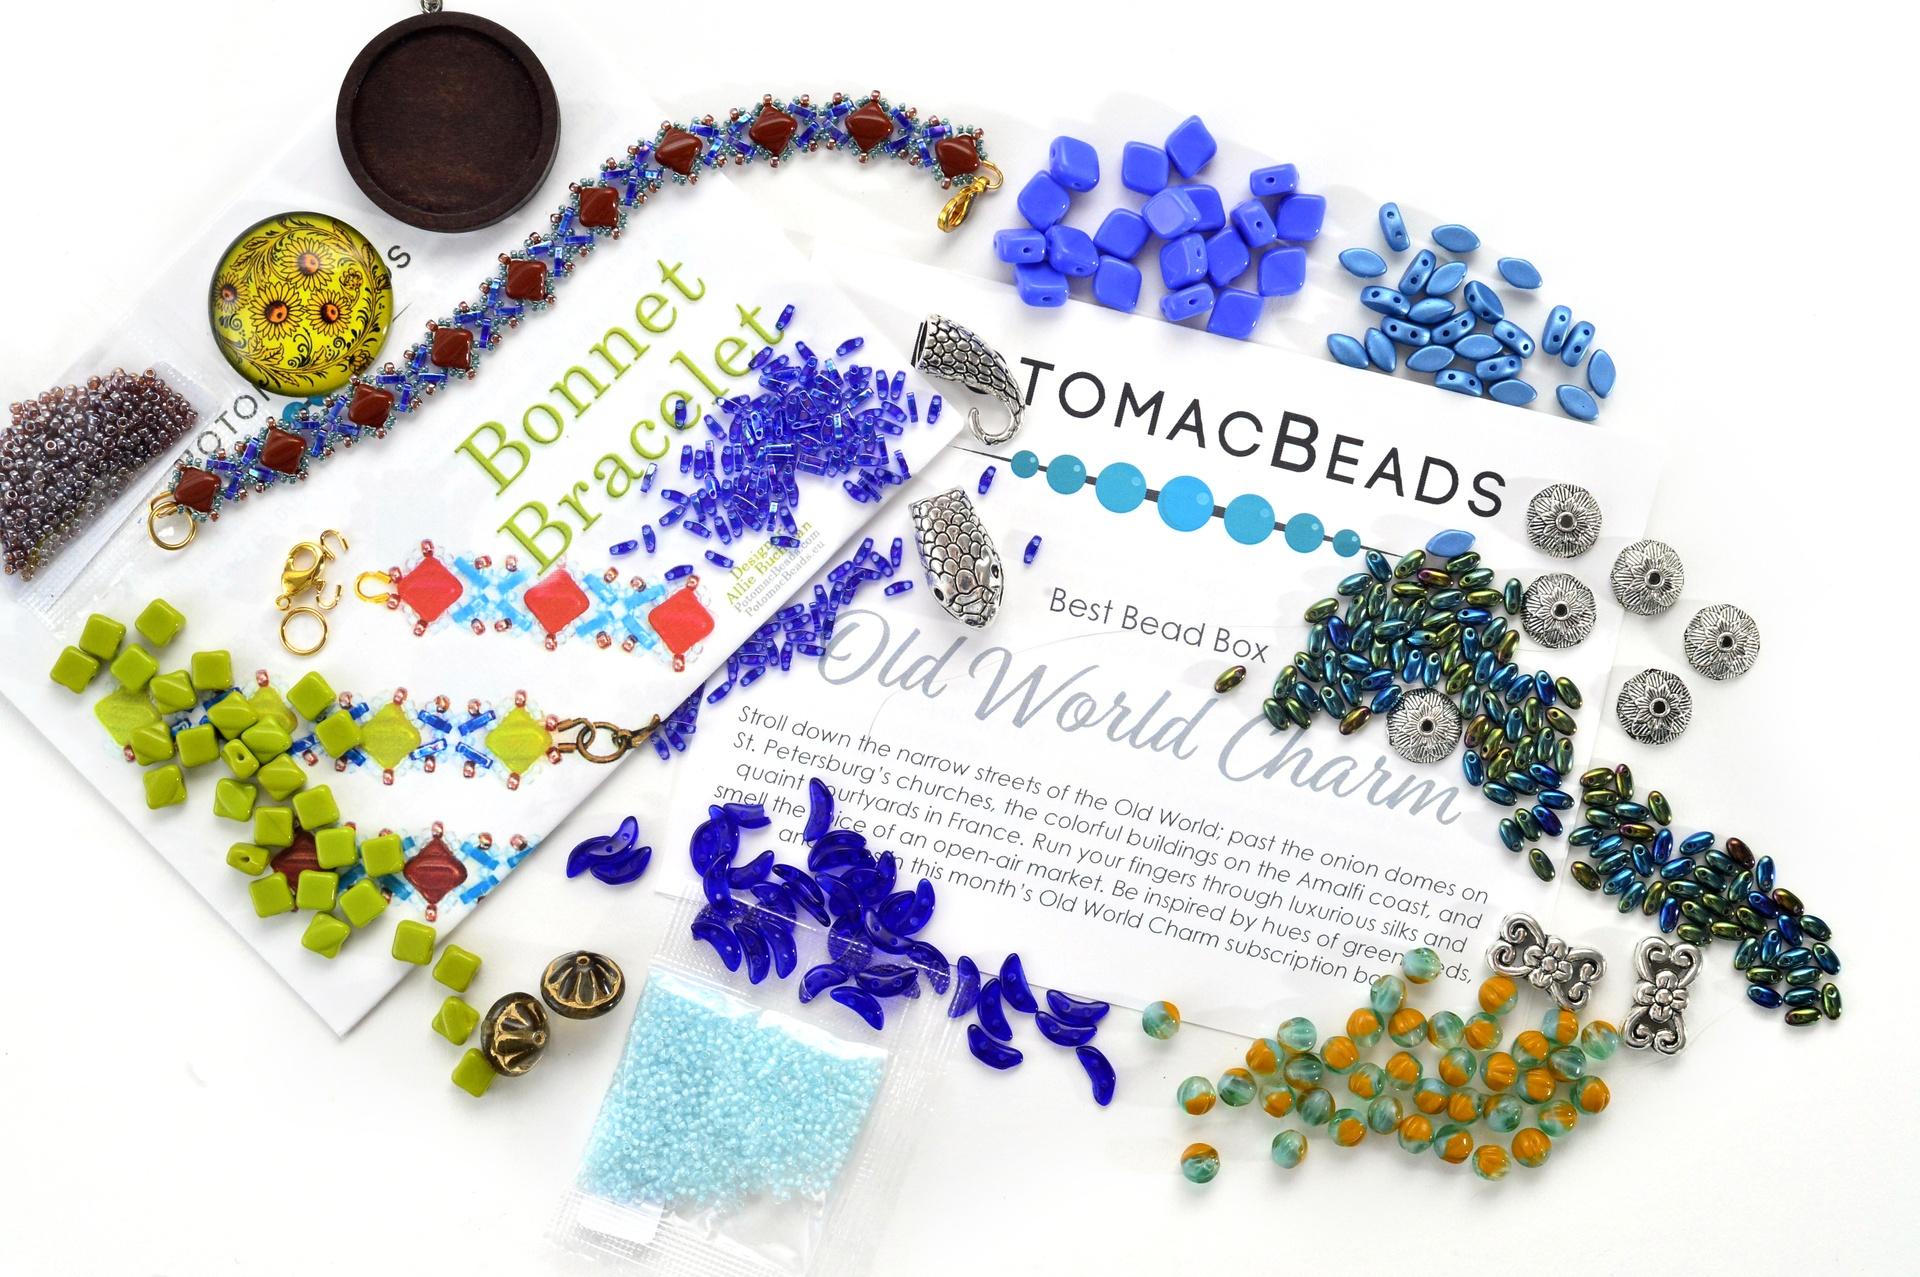 Subscription Inspiration / Best Bead Box July 2020